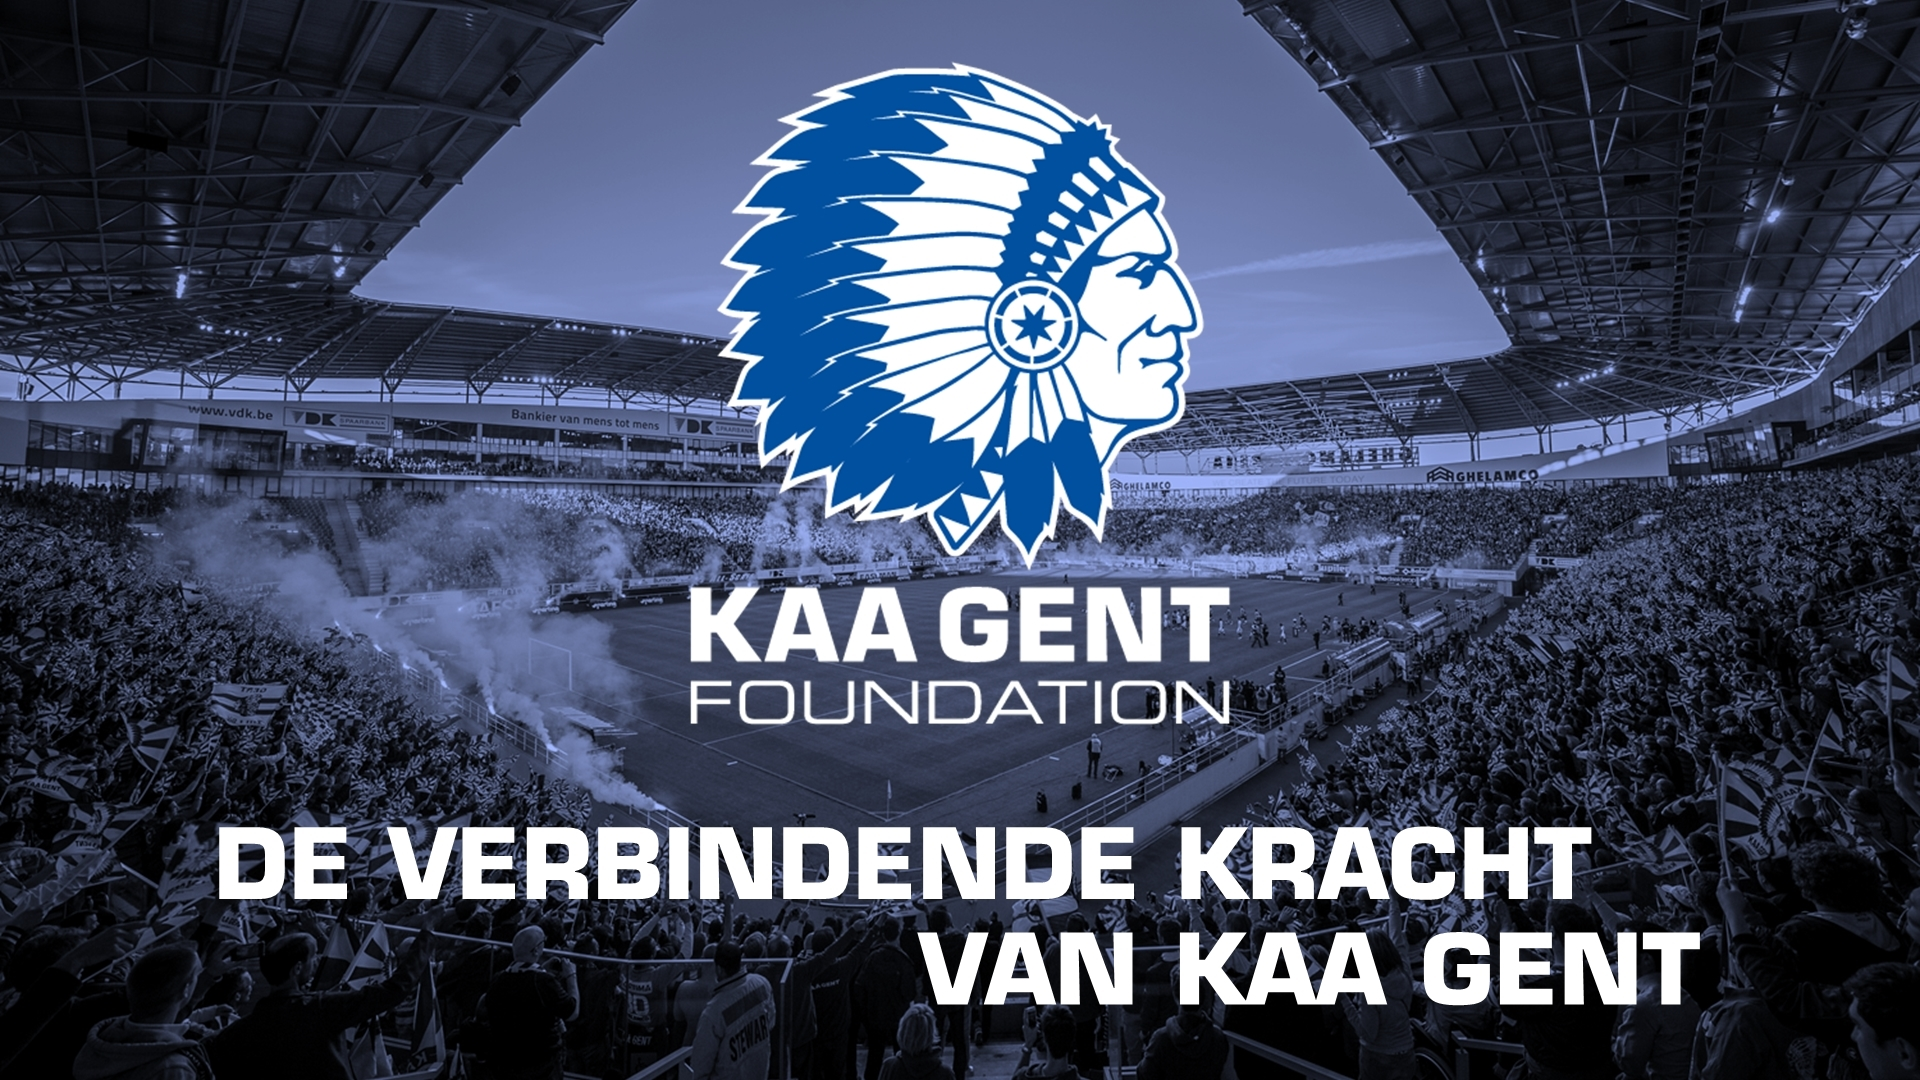 Kaa Gent Foundation Policy Plan 2017 2020 European